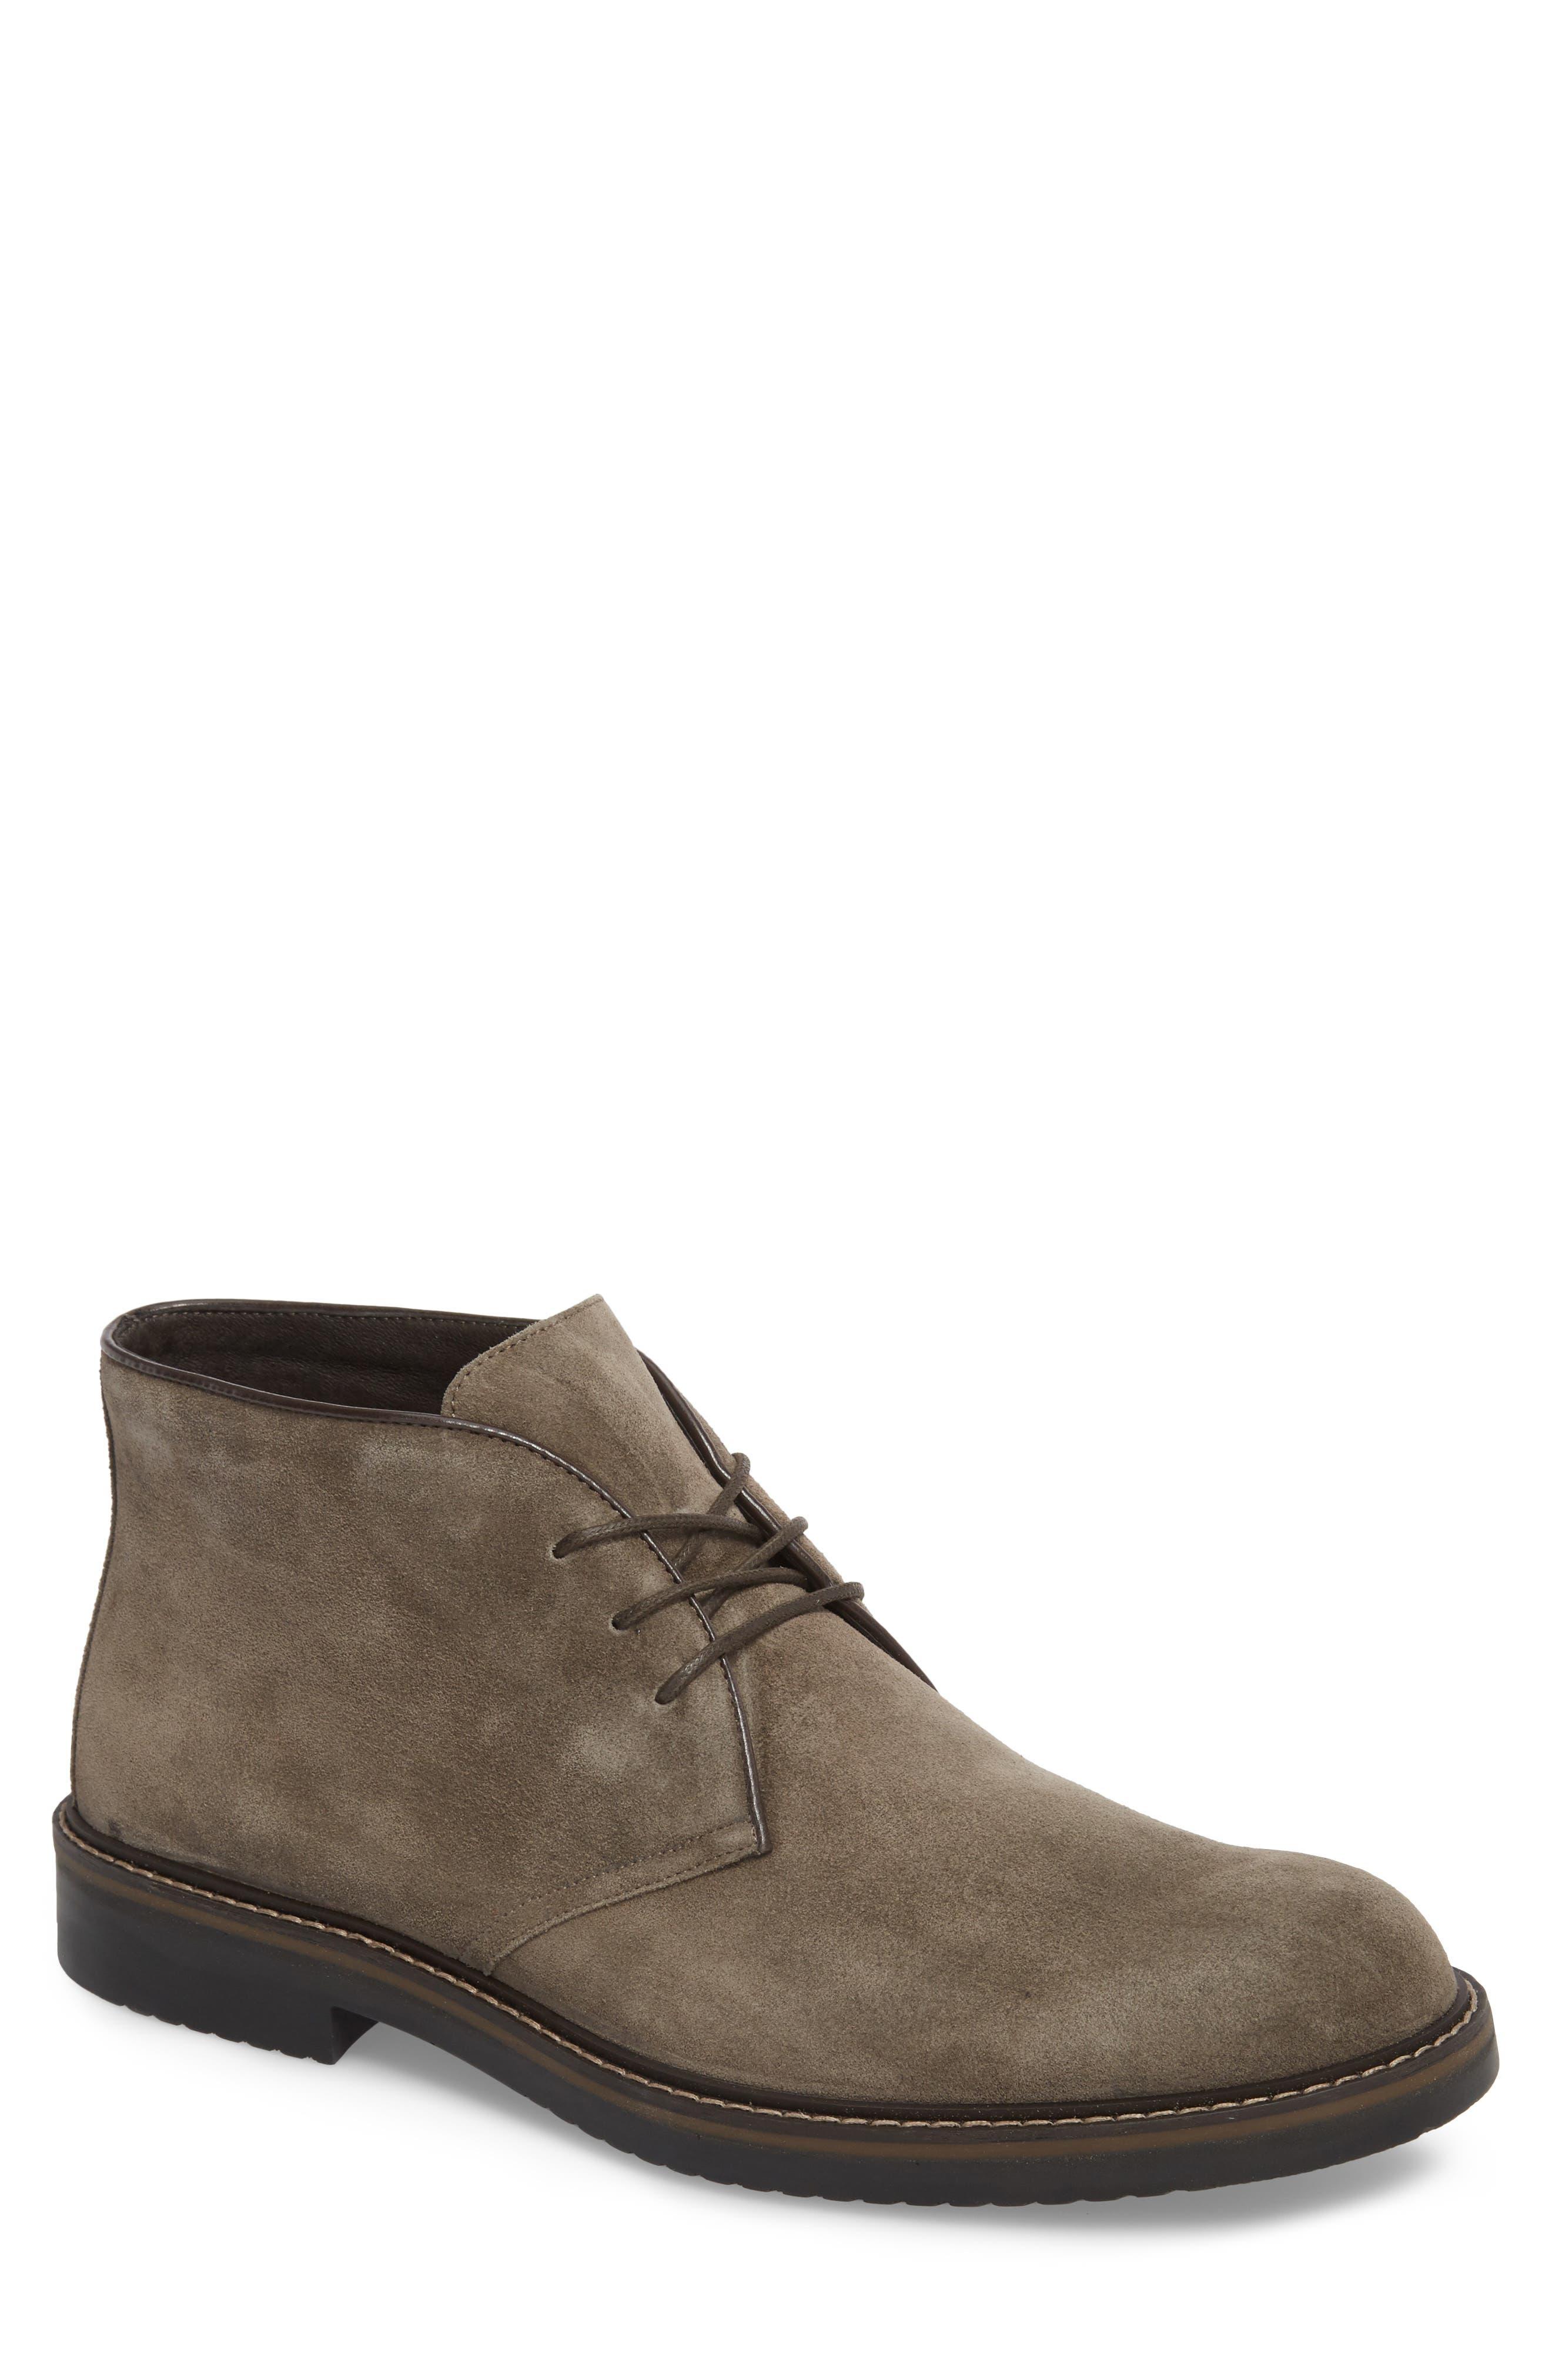 Bradford Chukka Boot,                         Main,                         color, 021